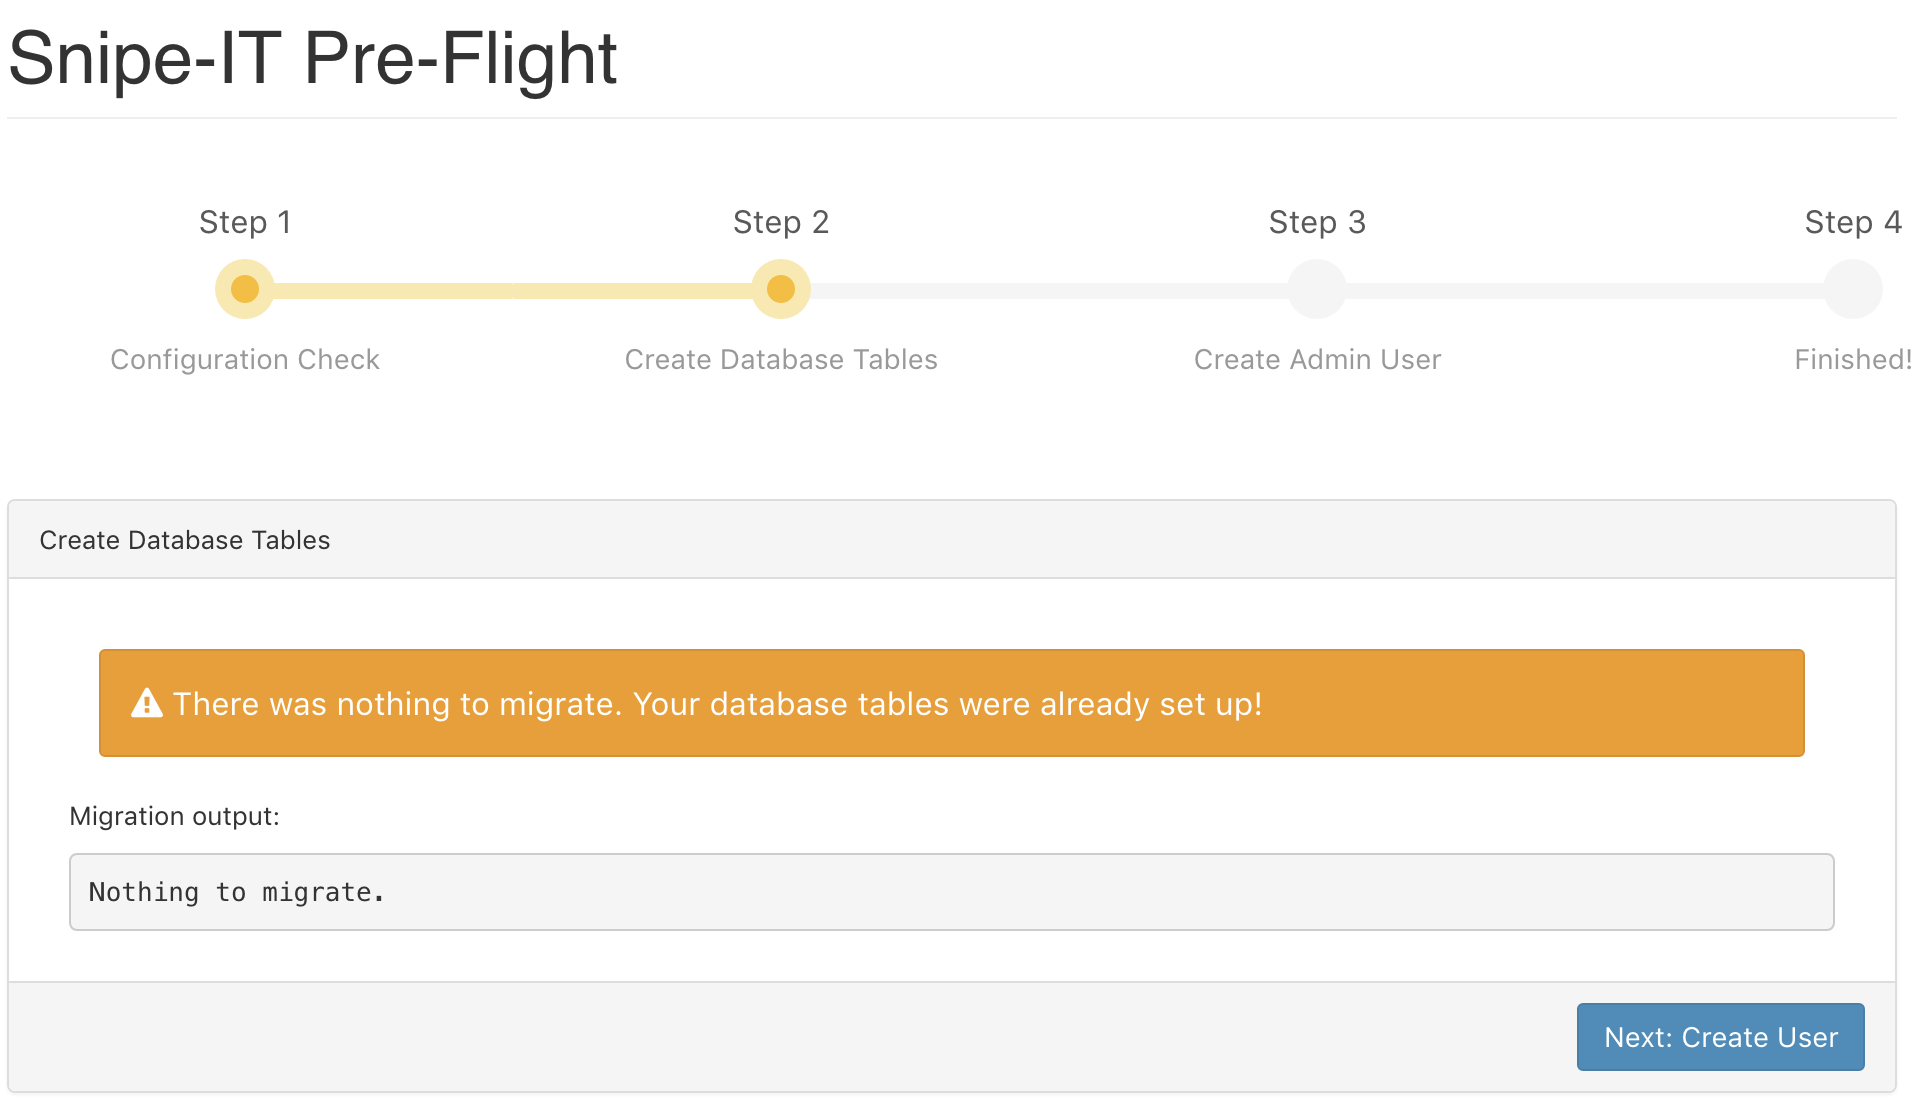 Snipe-IT Pre-Flight: Create Database Tables